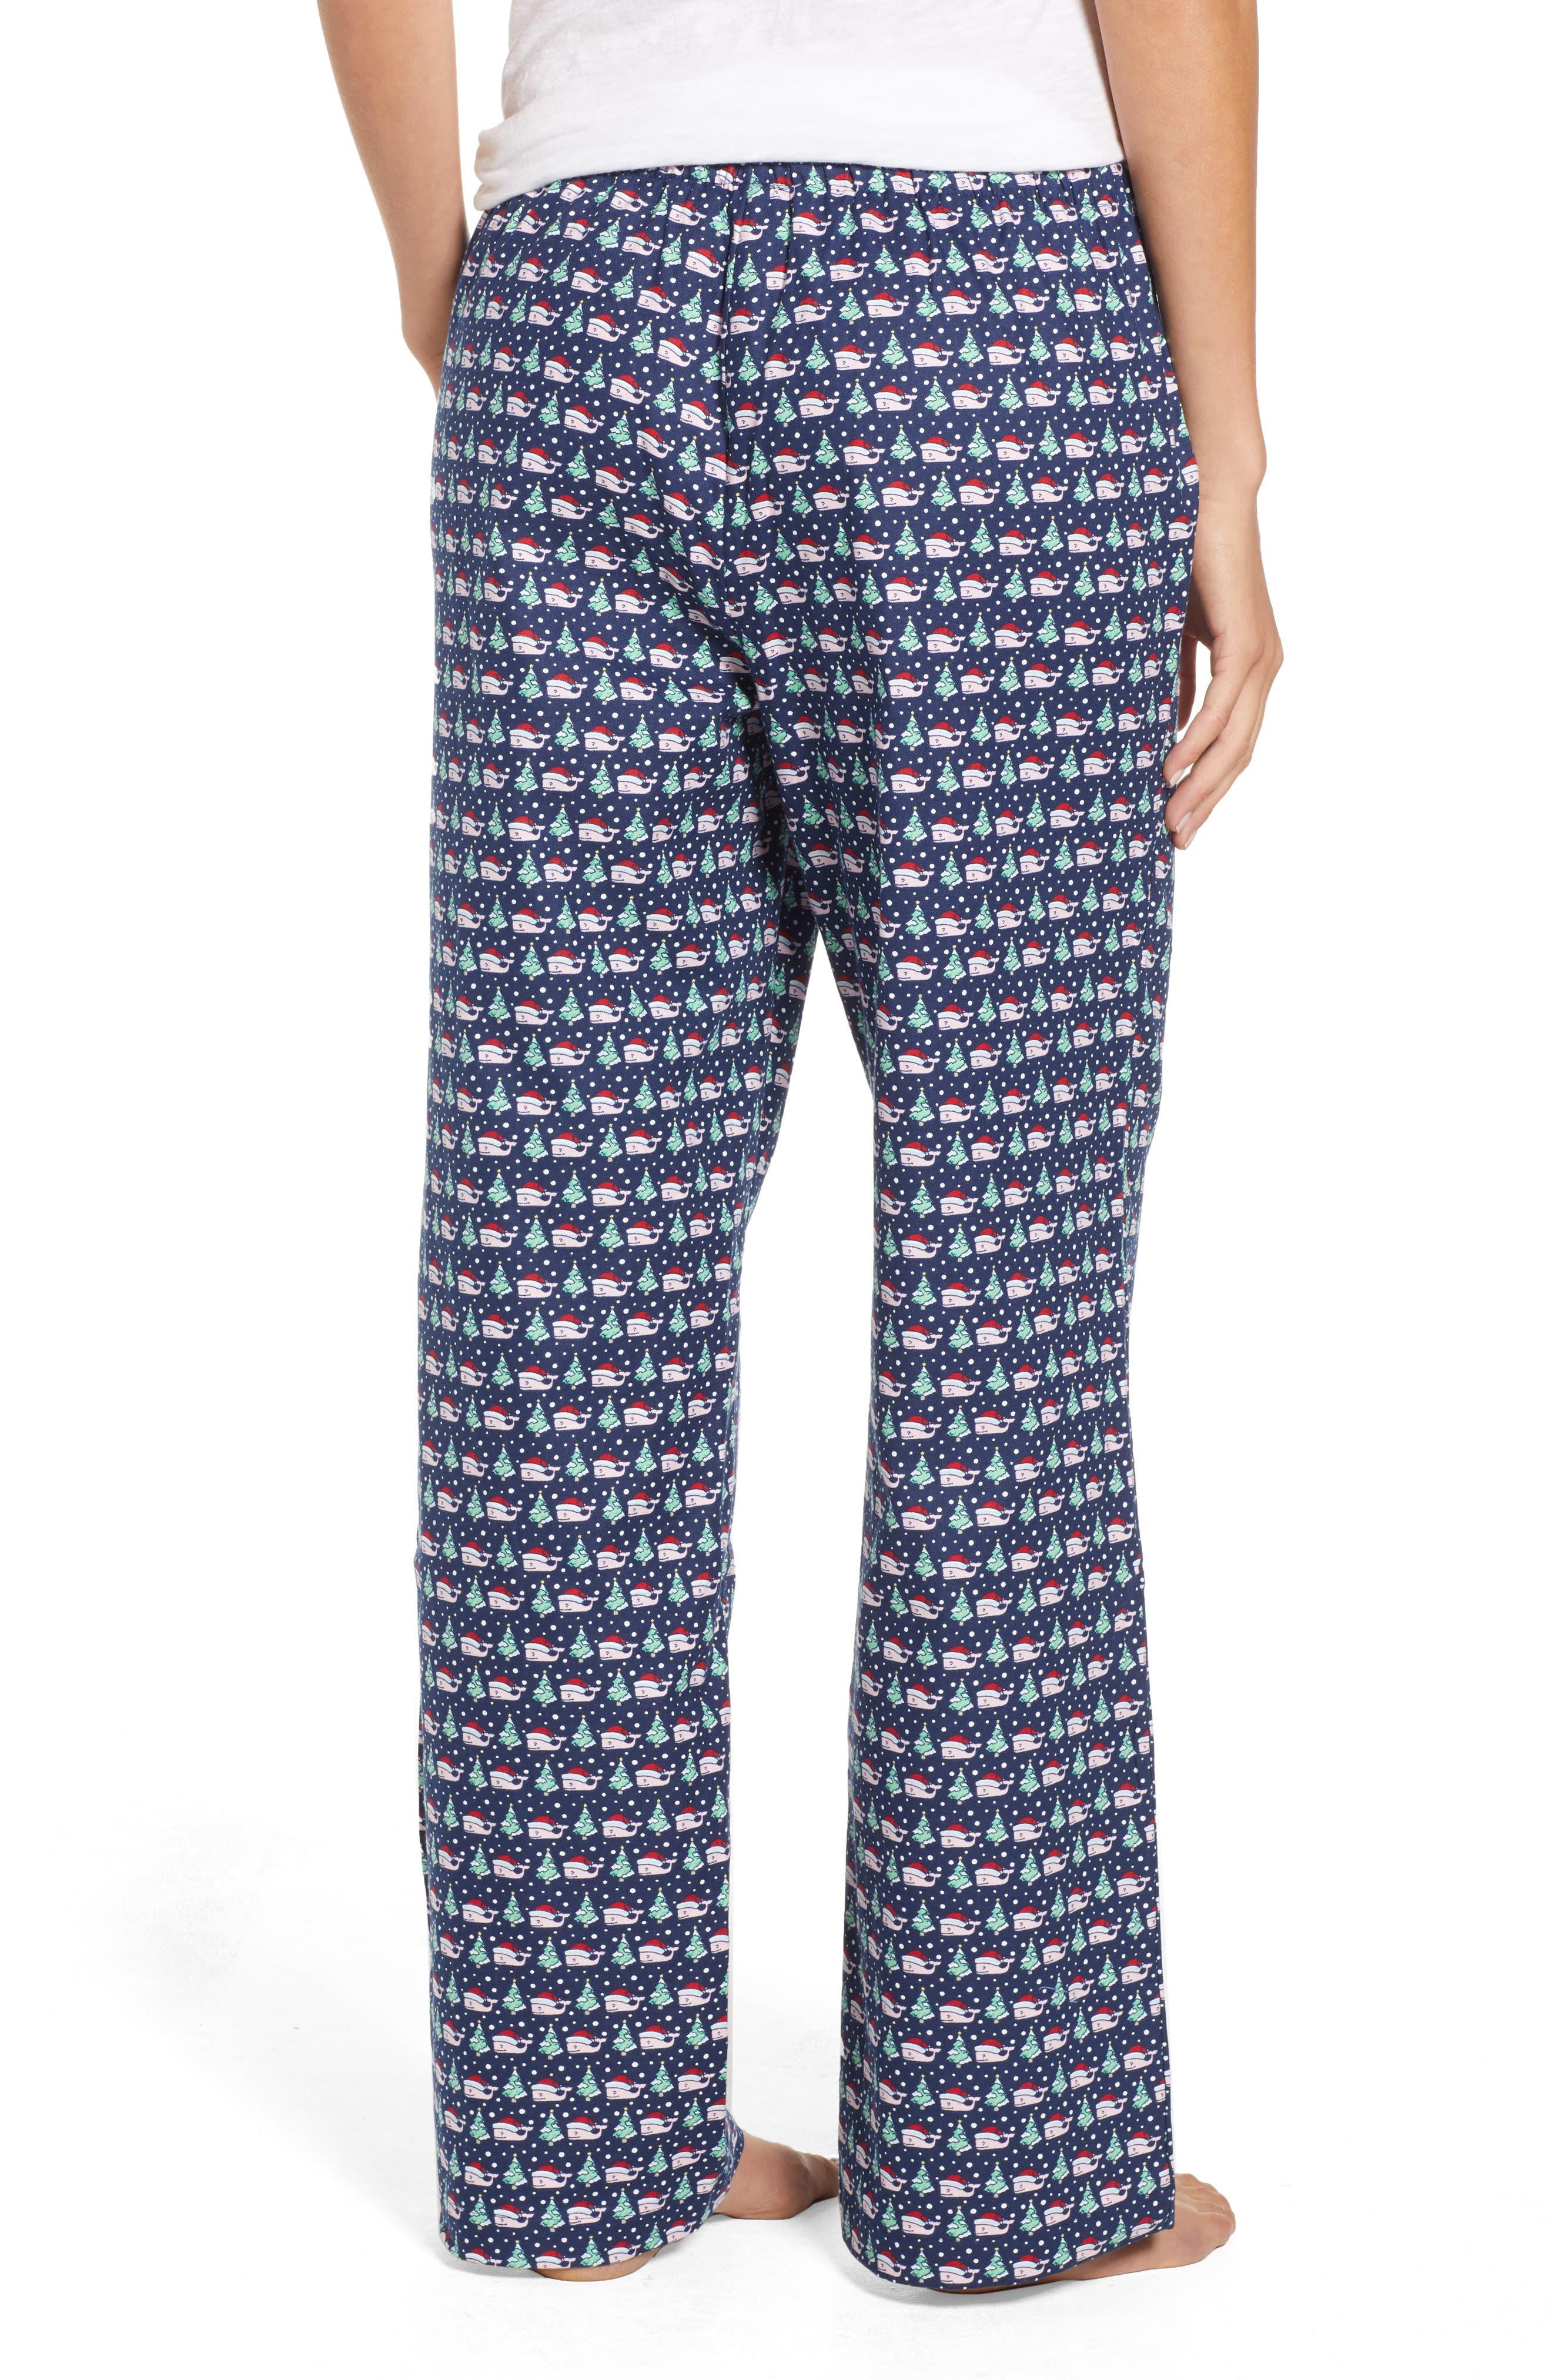 Santa Whale Lounge Pants,                             Alternate thumbnail 2, color,                             DEEP BAY